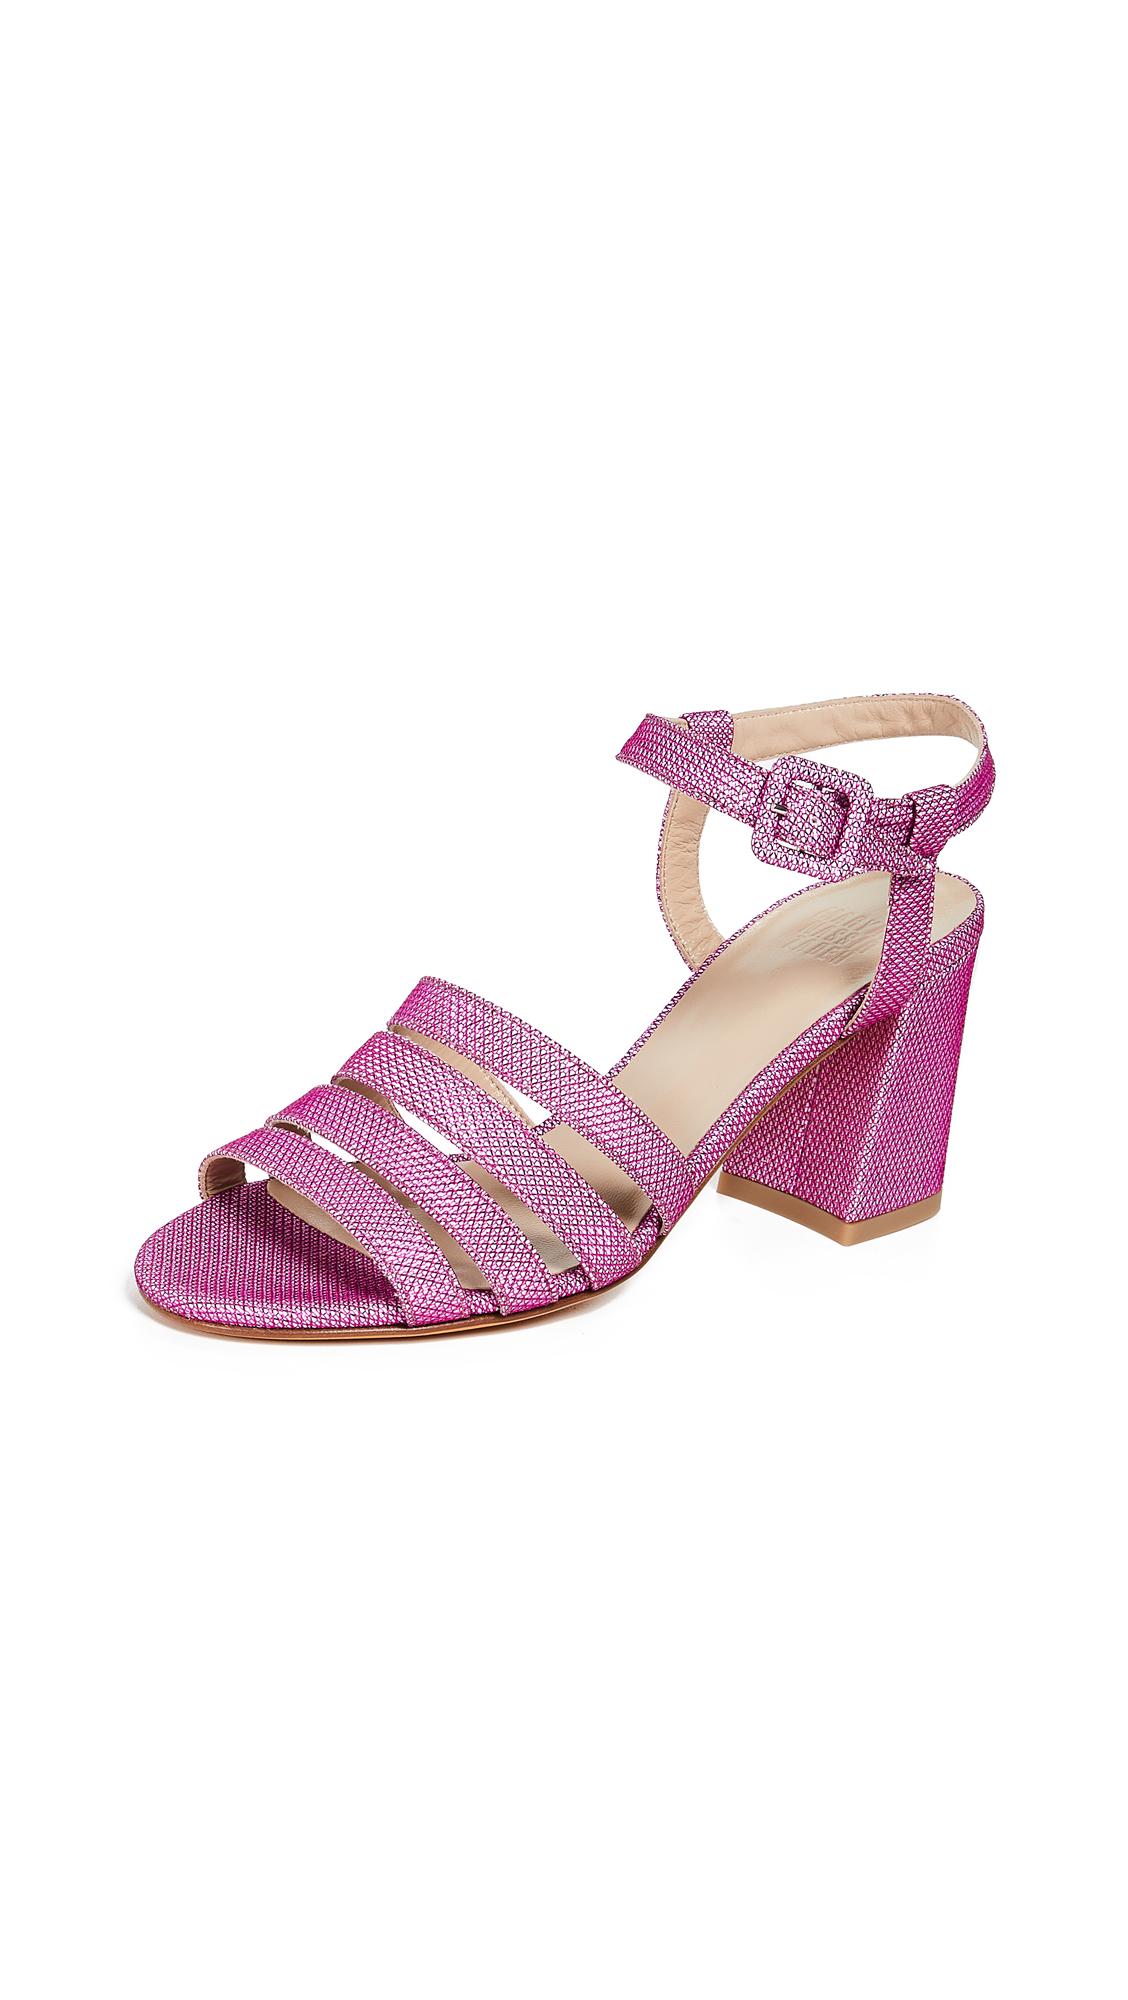 Maryam Nassir Zadeh Palma High Sandals - Fuchsia Sparkle